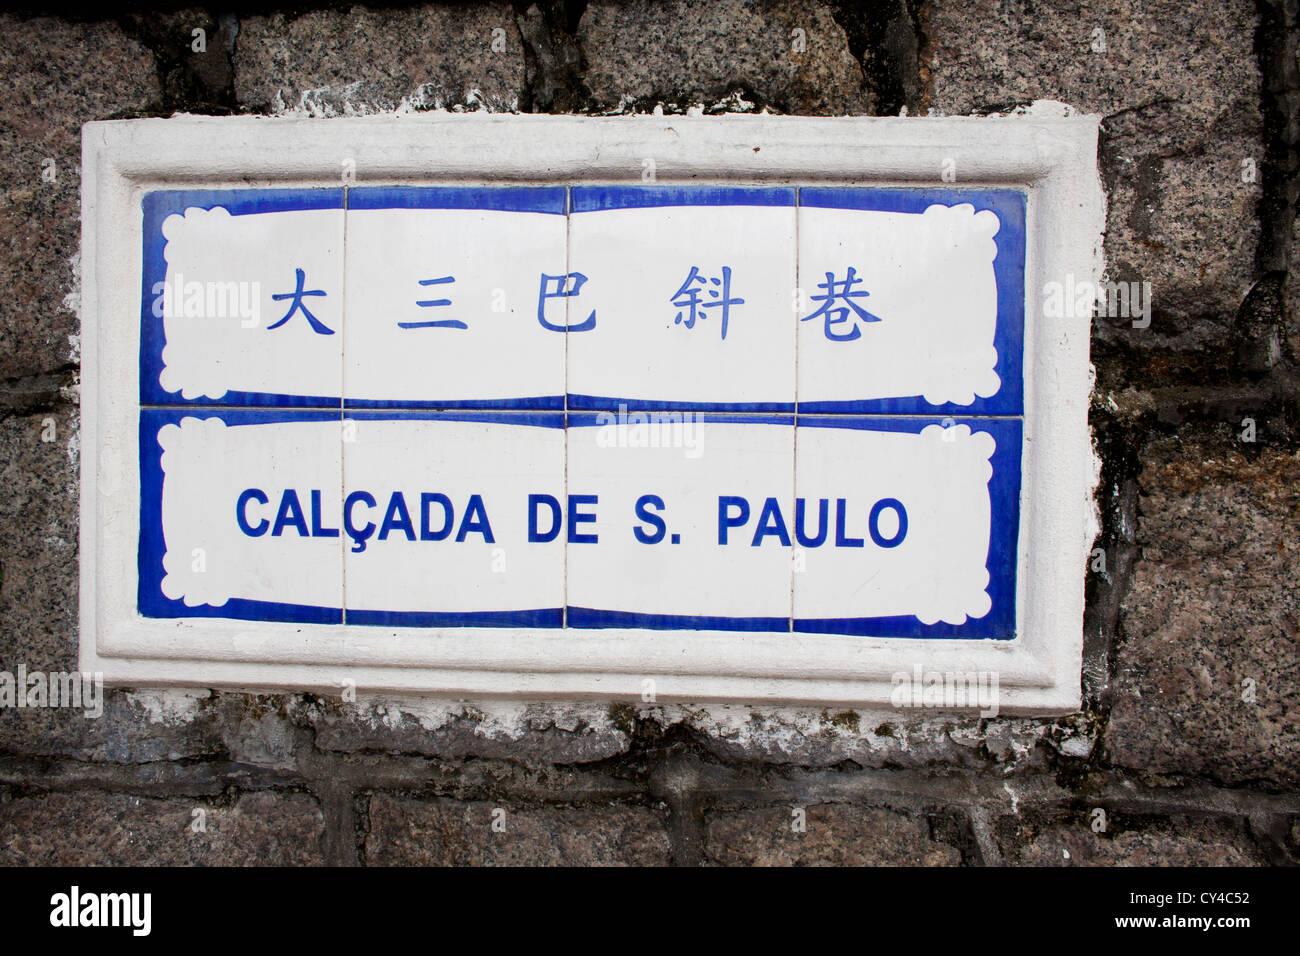 Portugese influence. streetsign in Macau, China - Stock Image